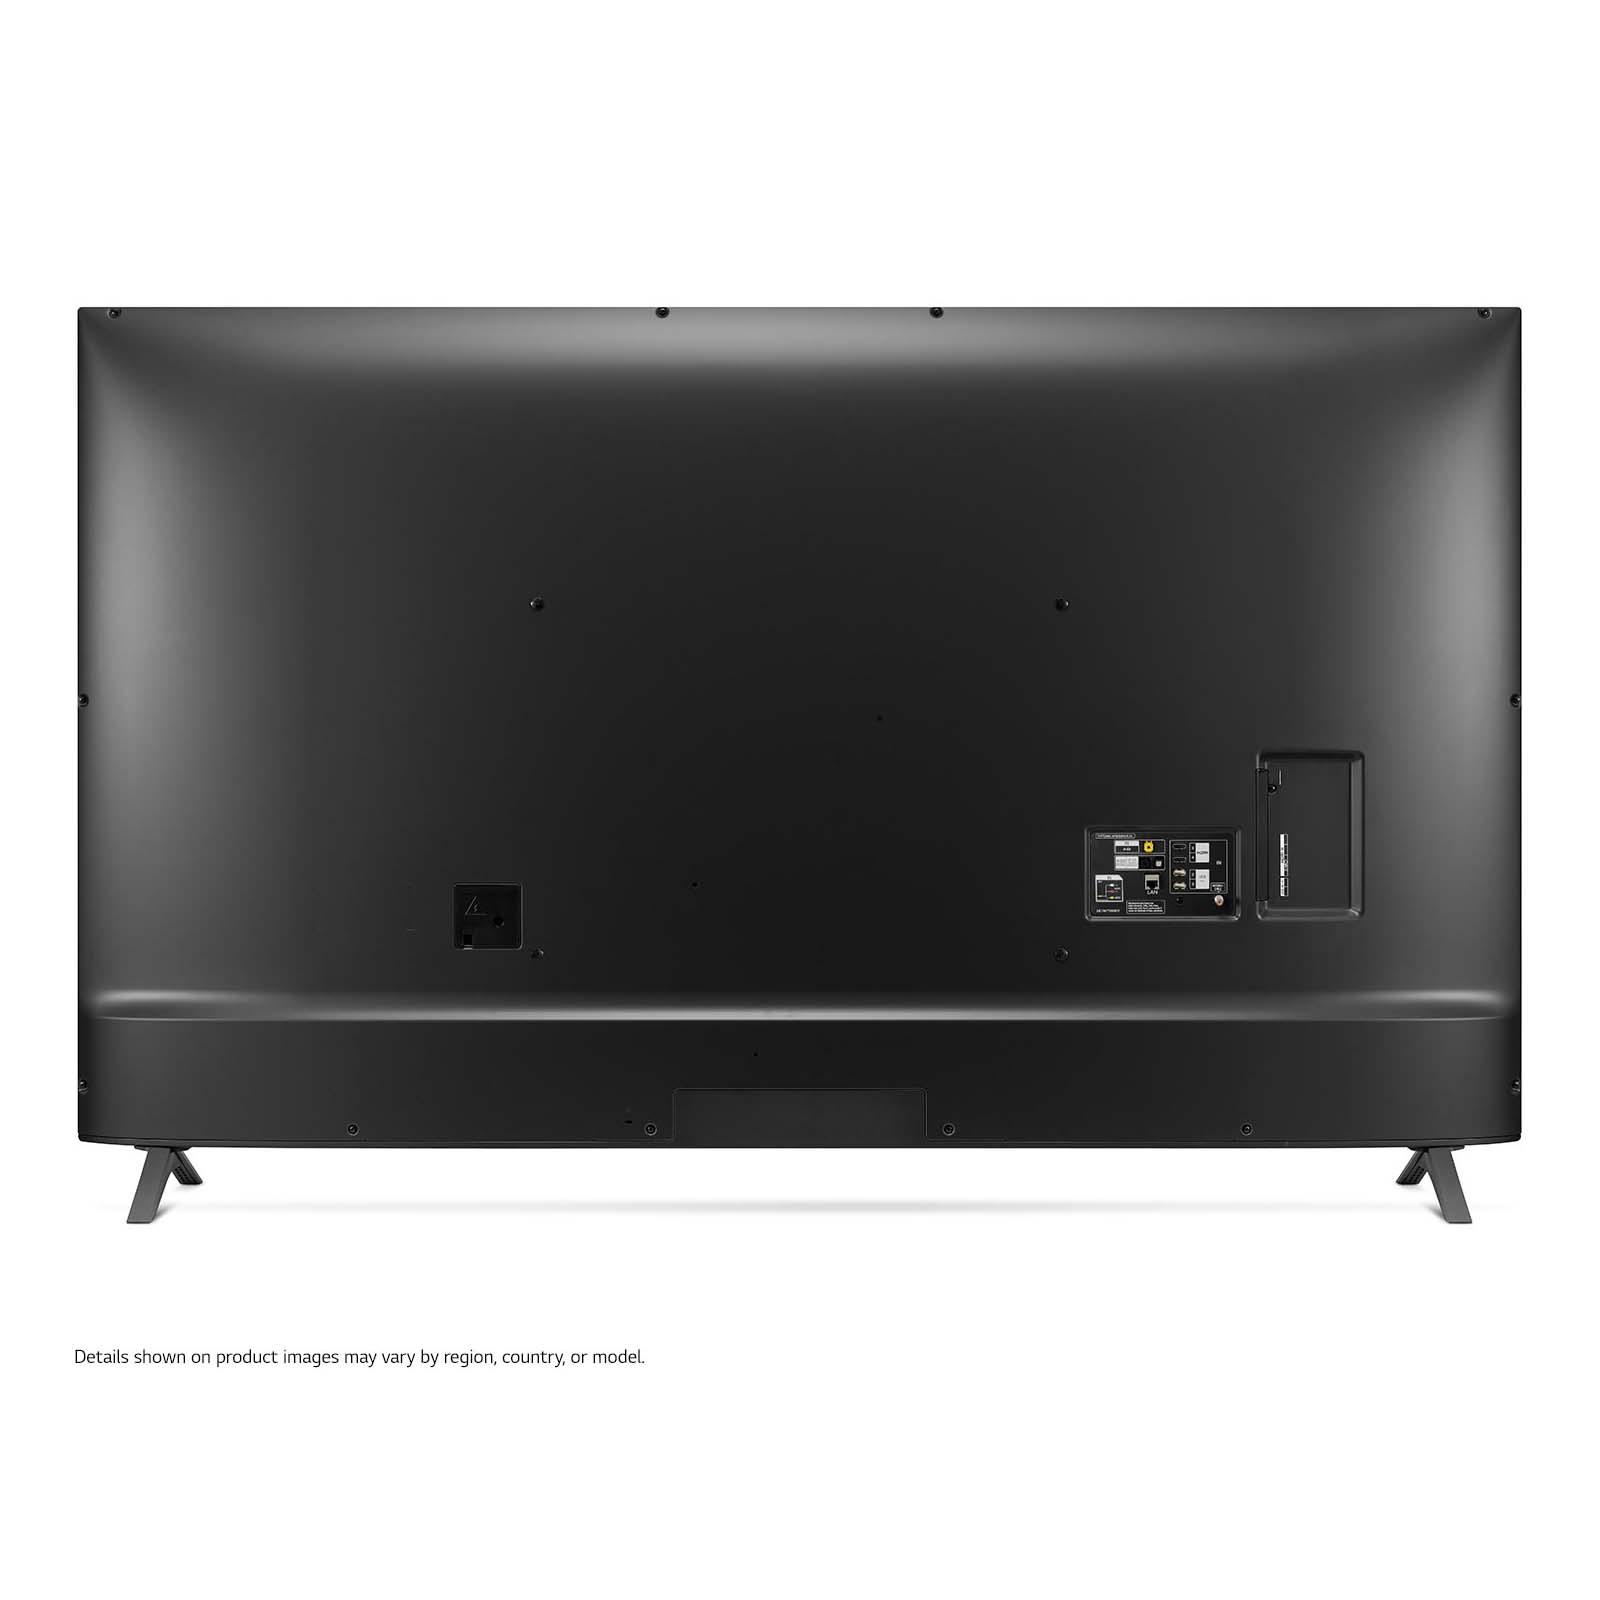 טלוויזיה LG 55NANO79VND 4K 55 אינטש